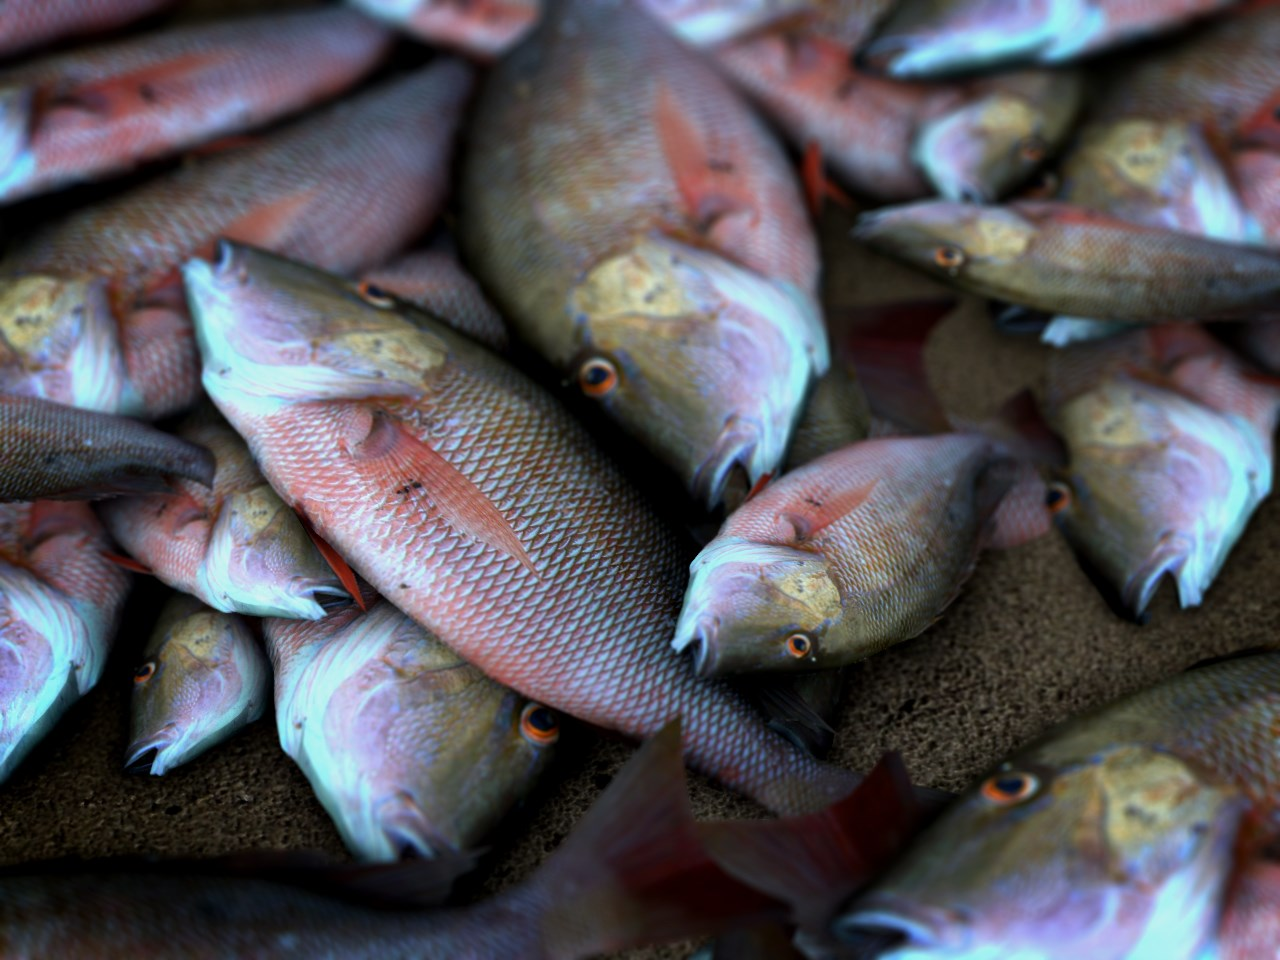 fish kill_1515800927460.jpg.jpg